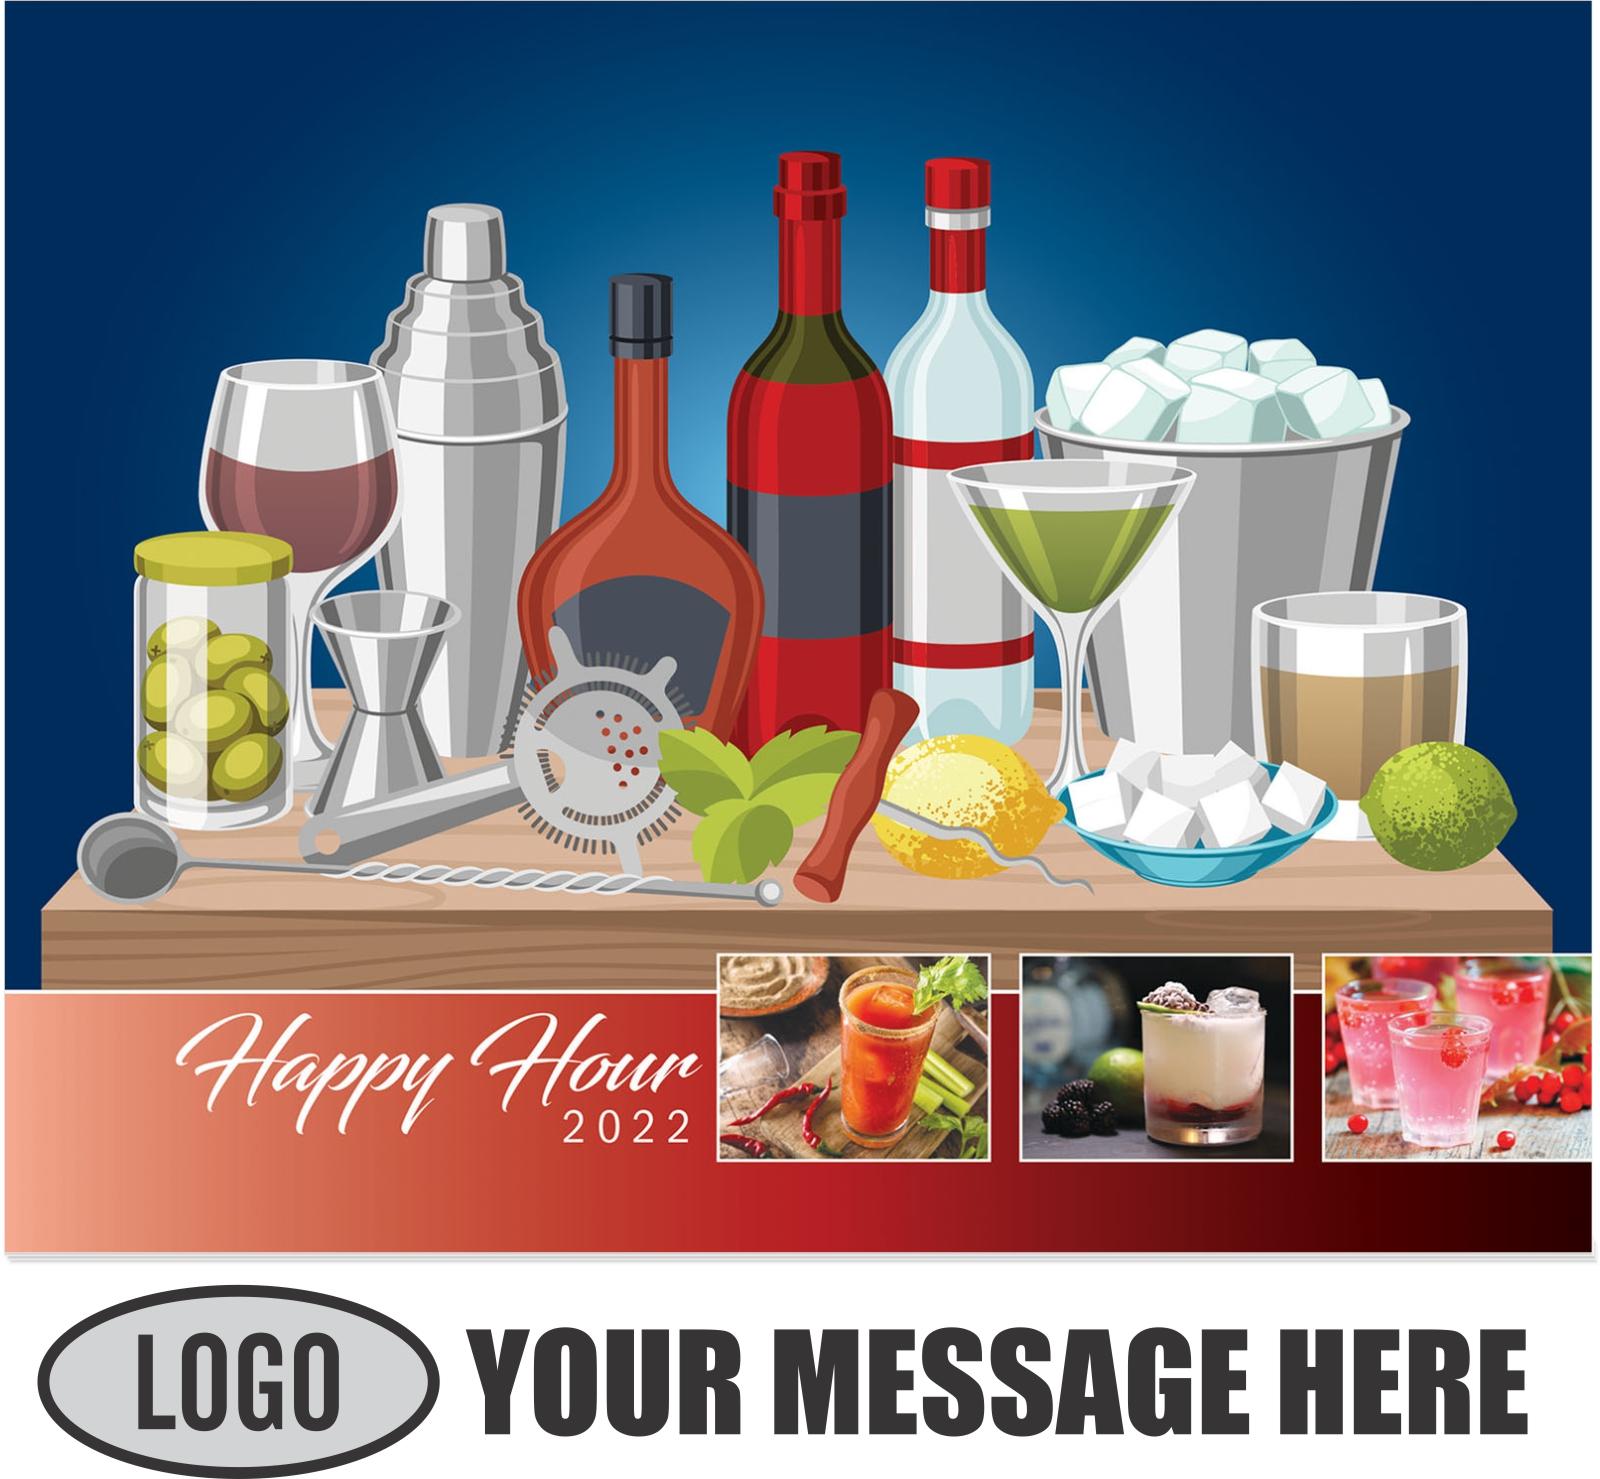 2022 Happy Hour Cocktails Promotional Calendar